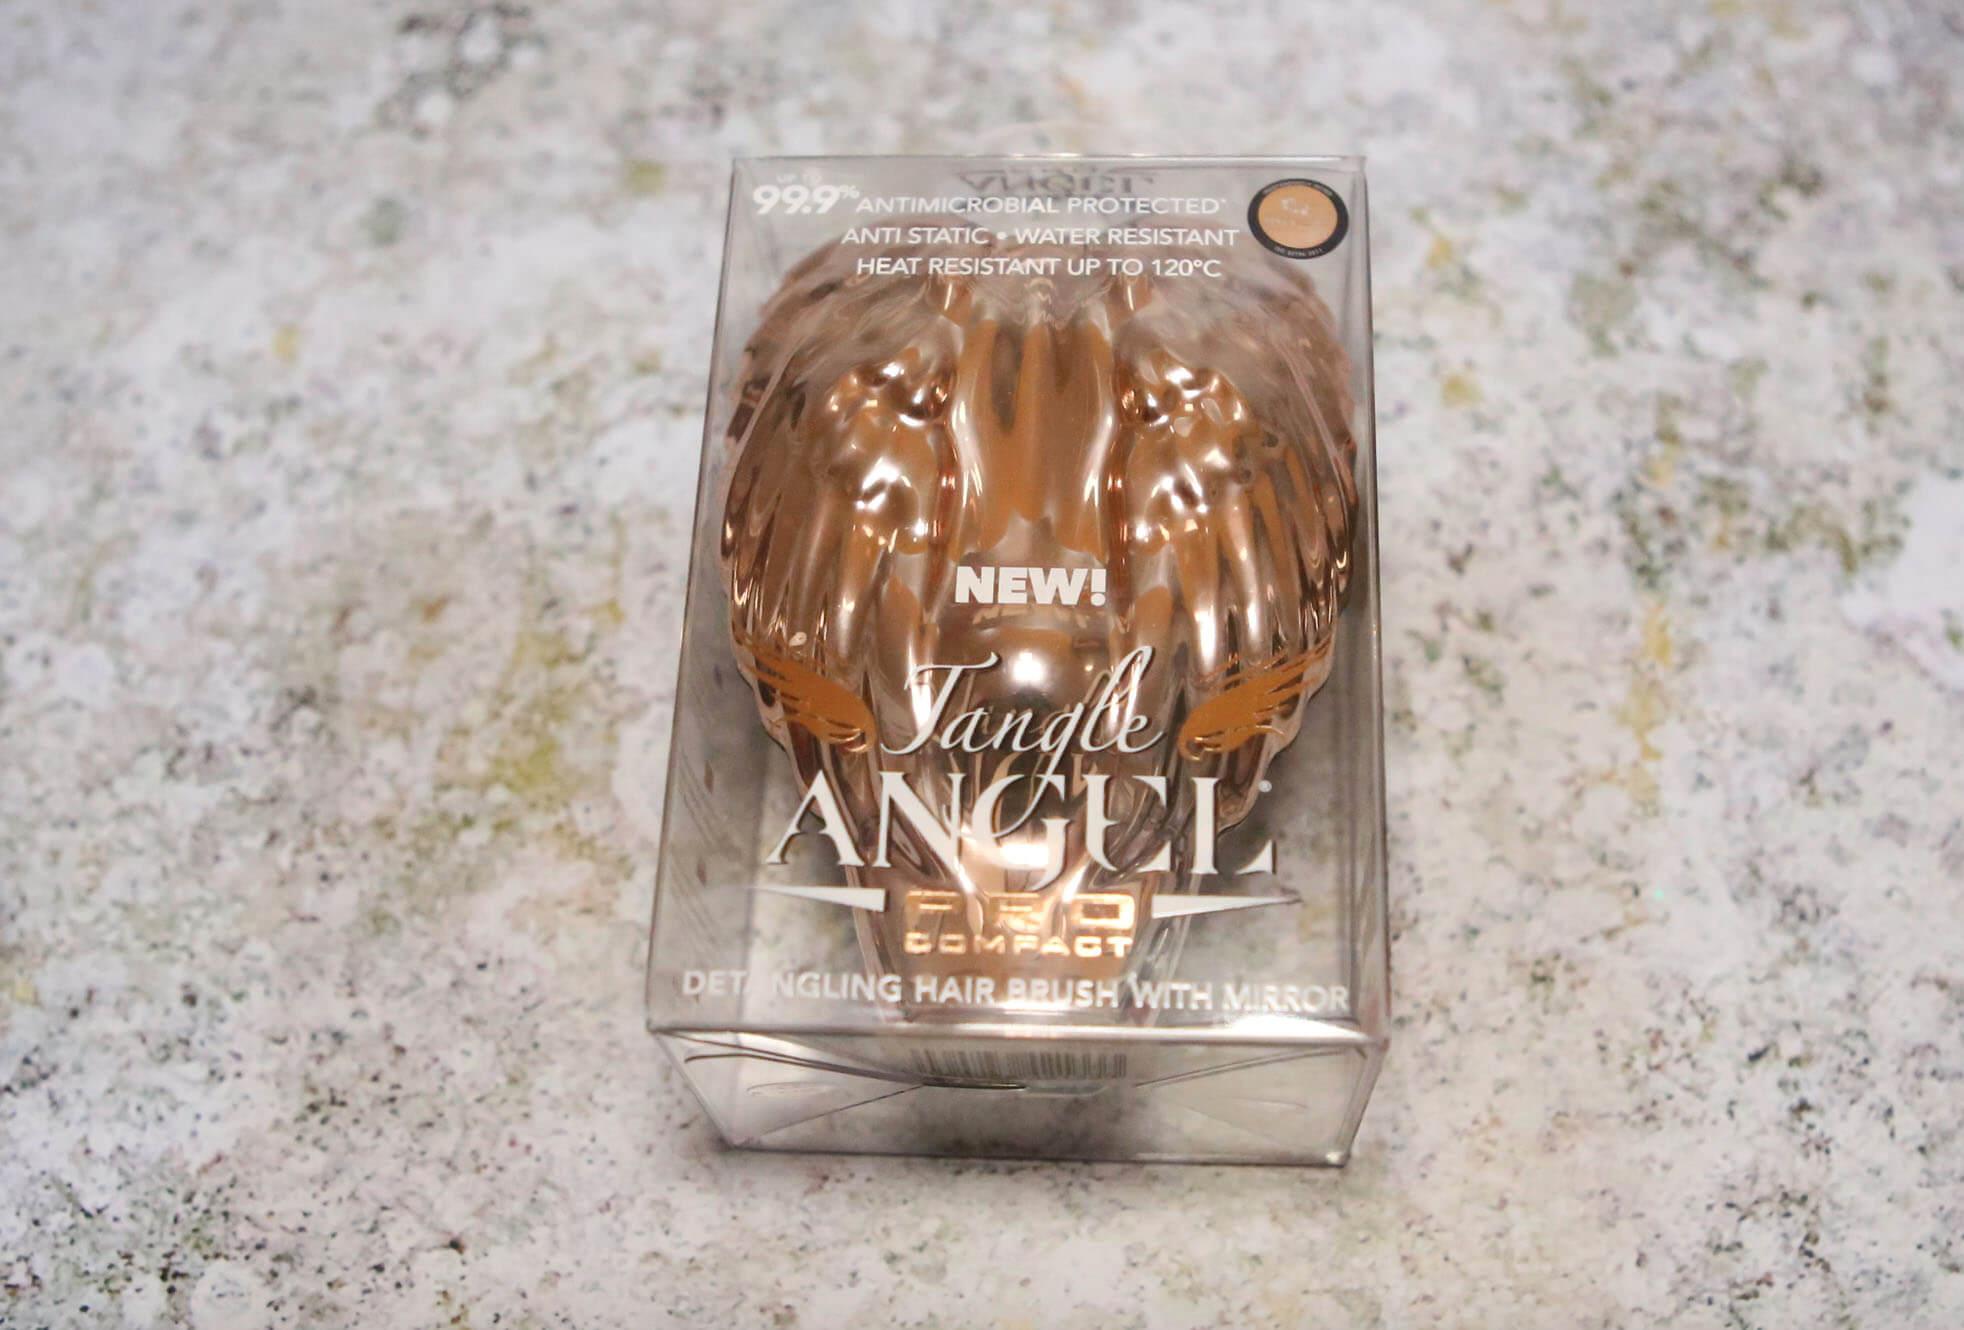 Things I Love - Tangel Angel